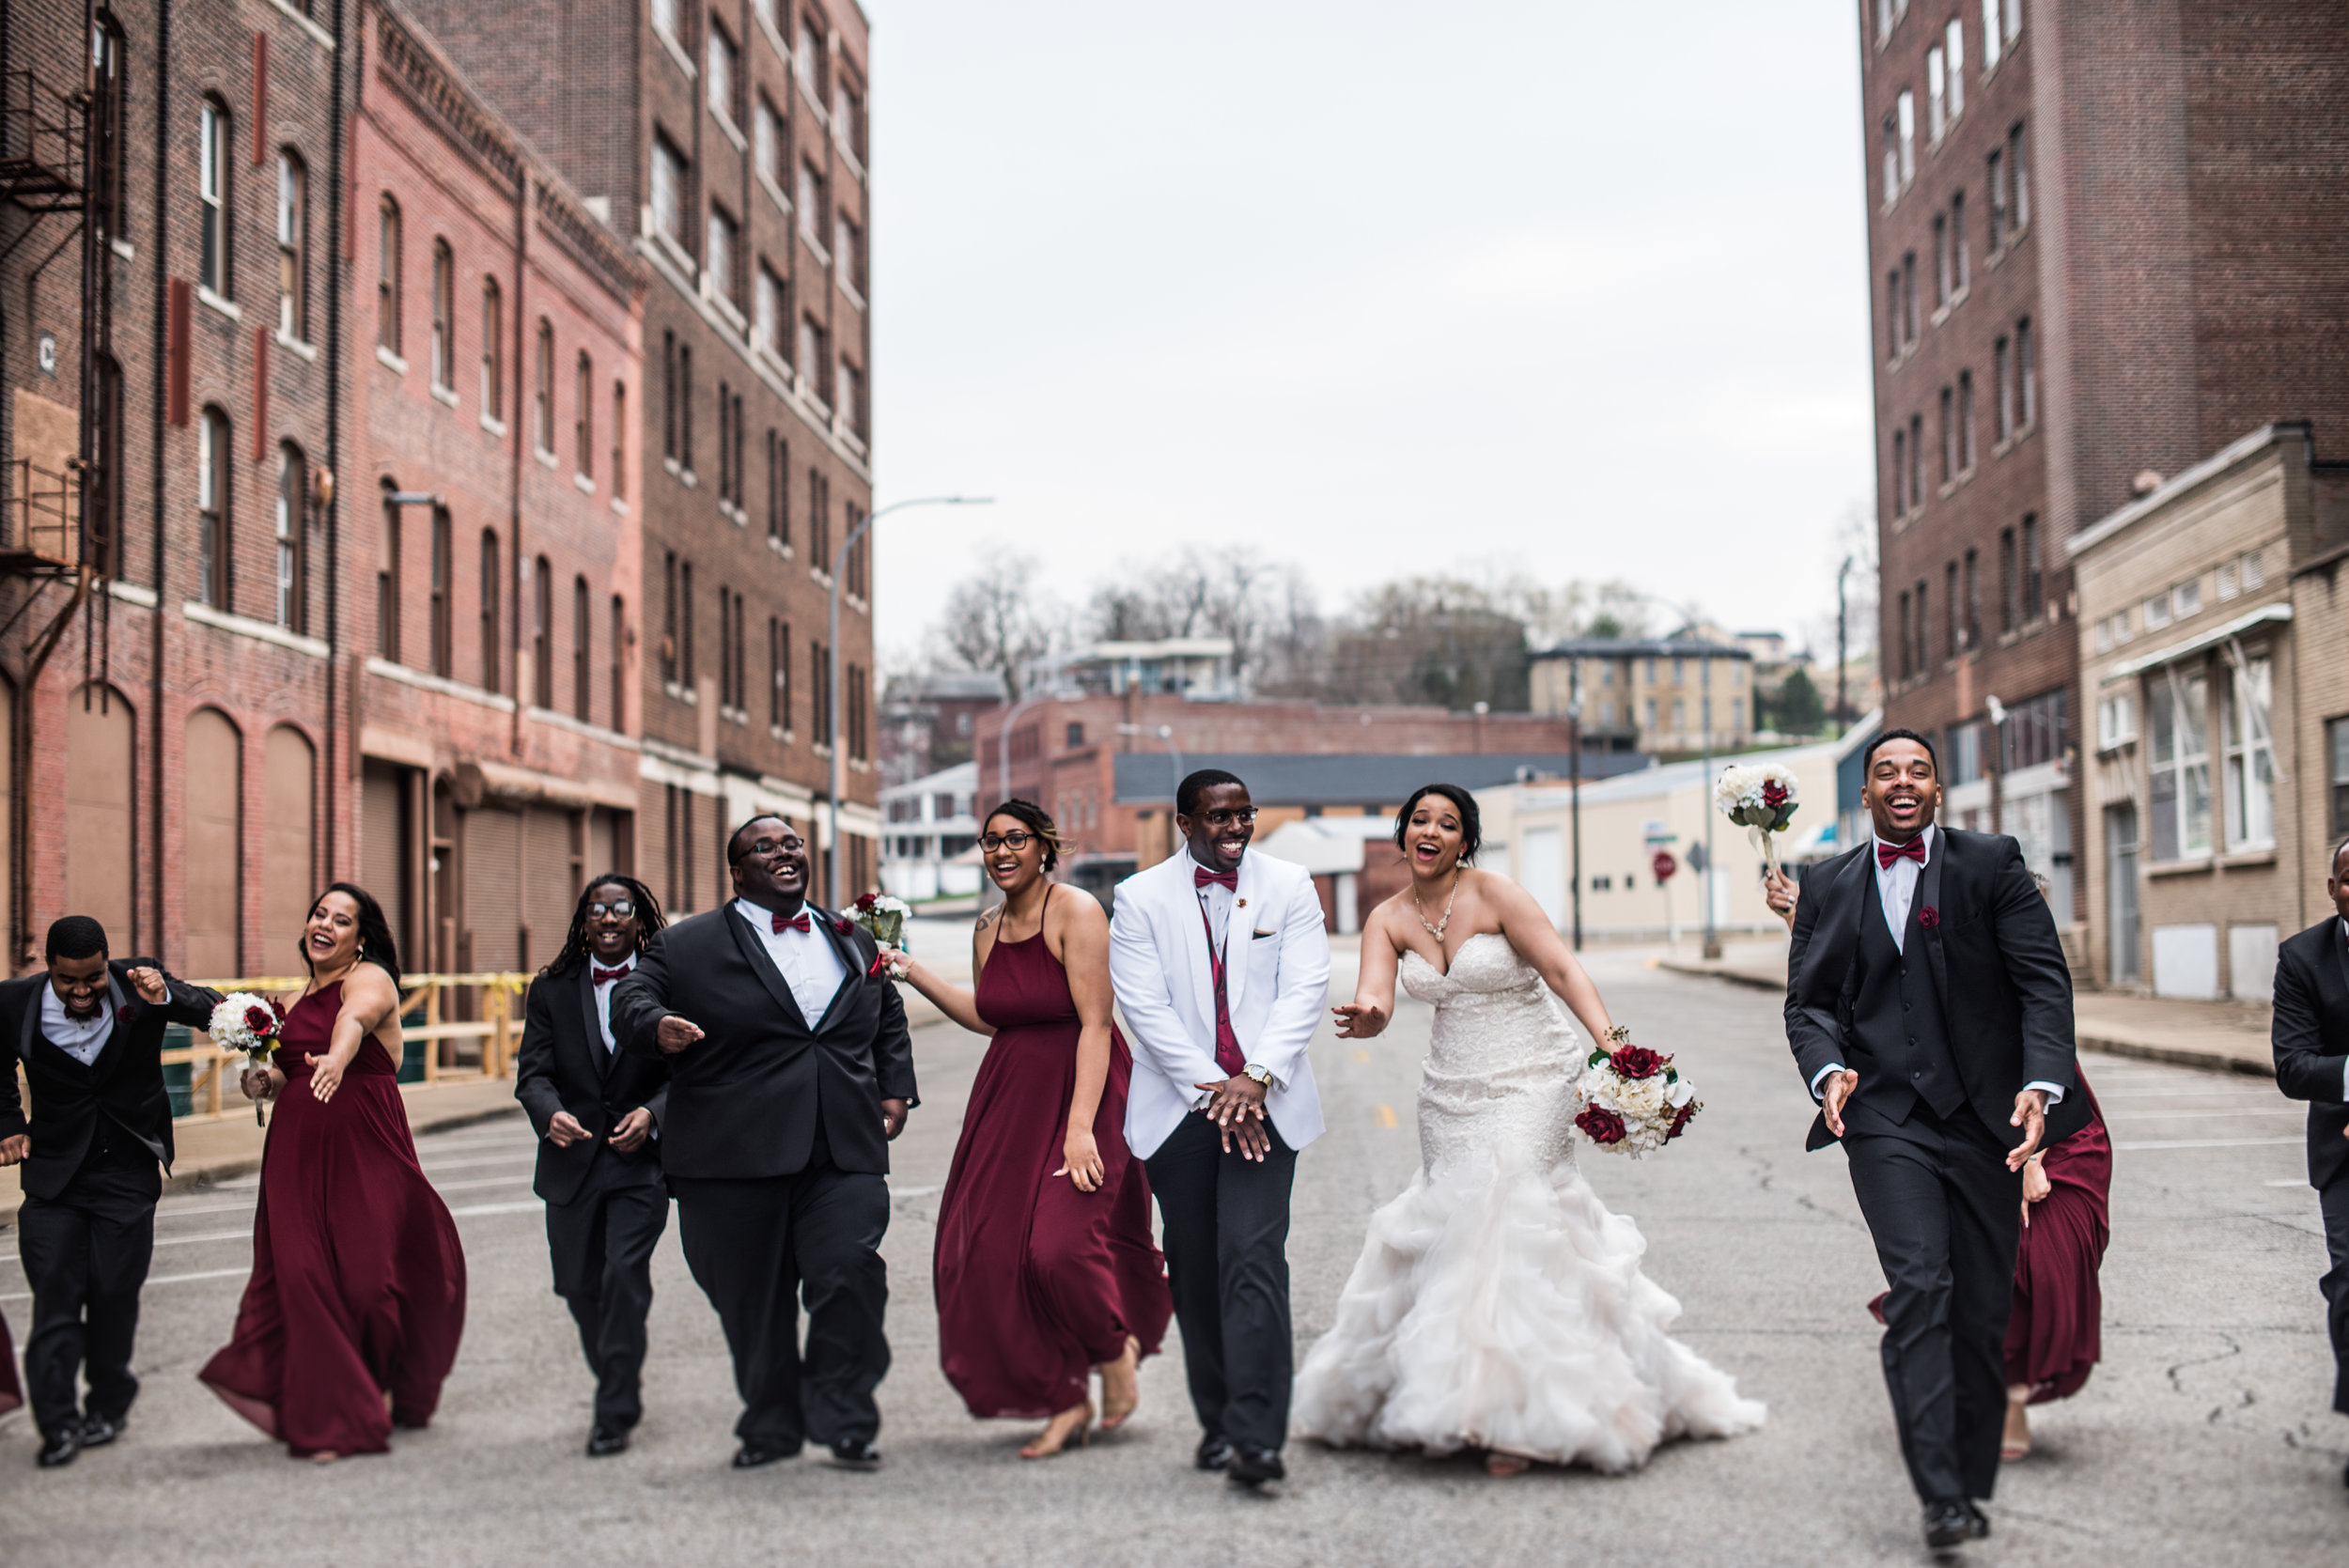 Burlington Iowa Wedding Midwest Photographer Melissa Cervantes _ Chantelle and Isaiah 555b.jpg